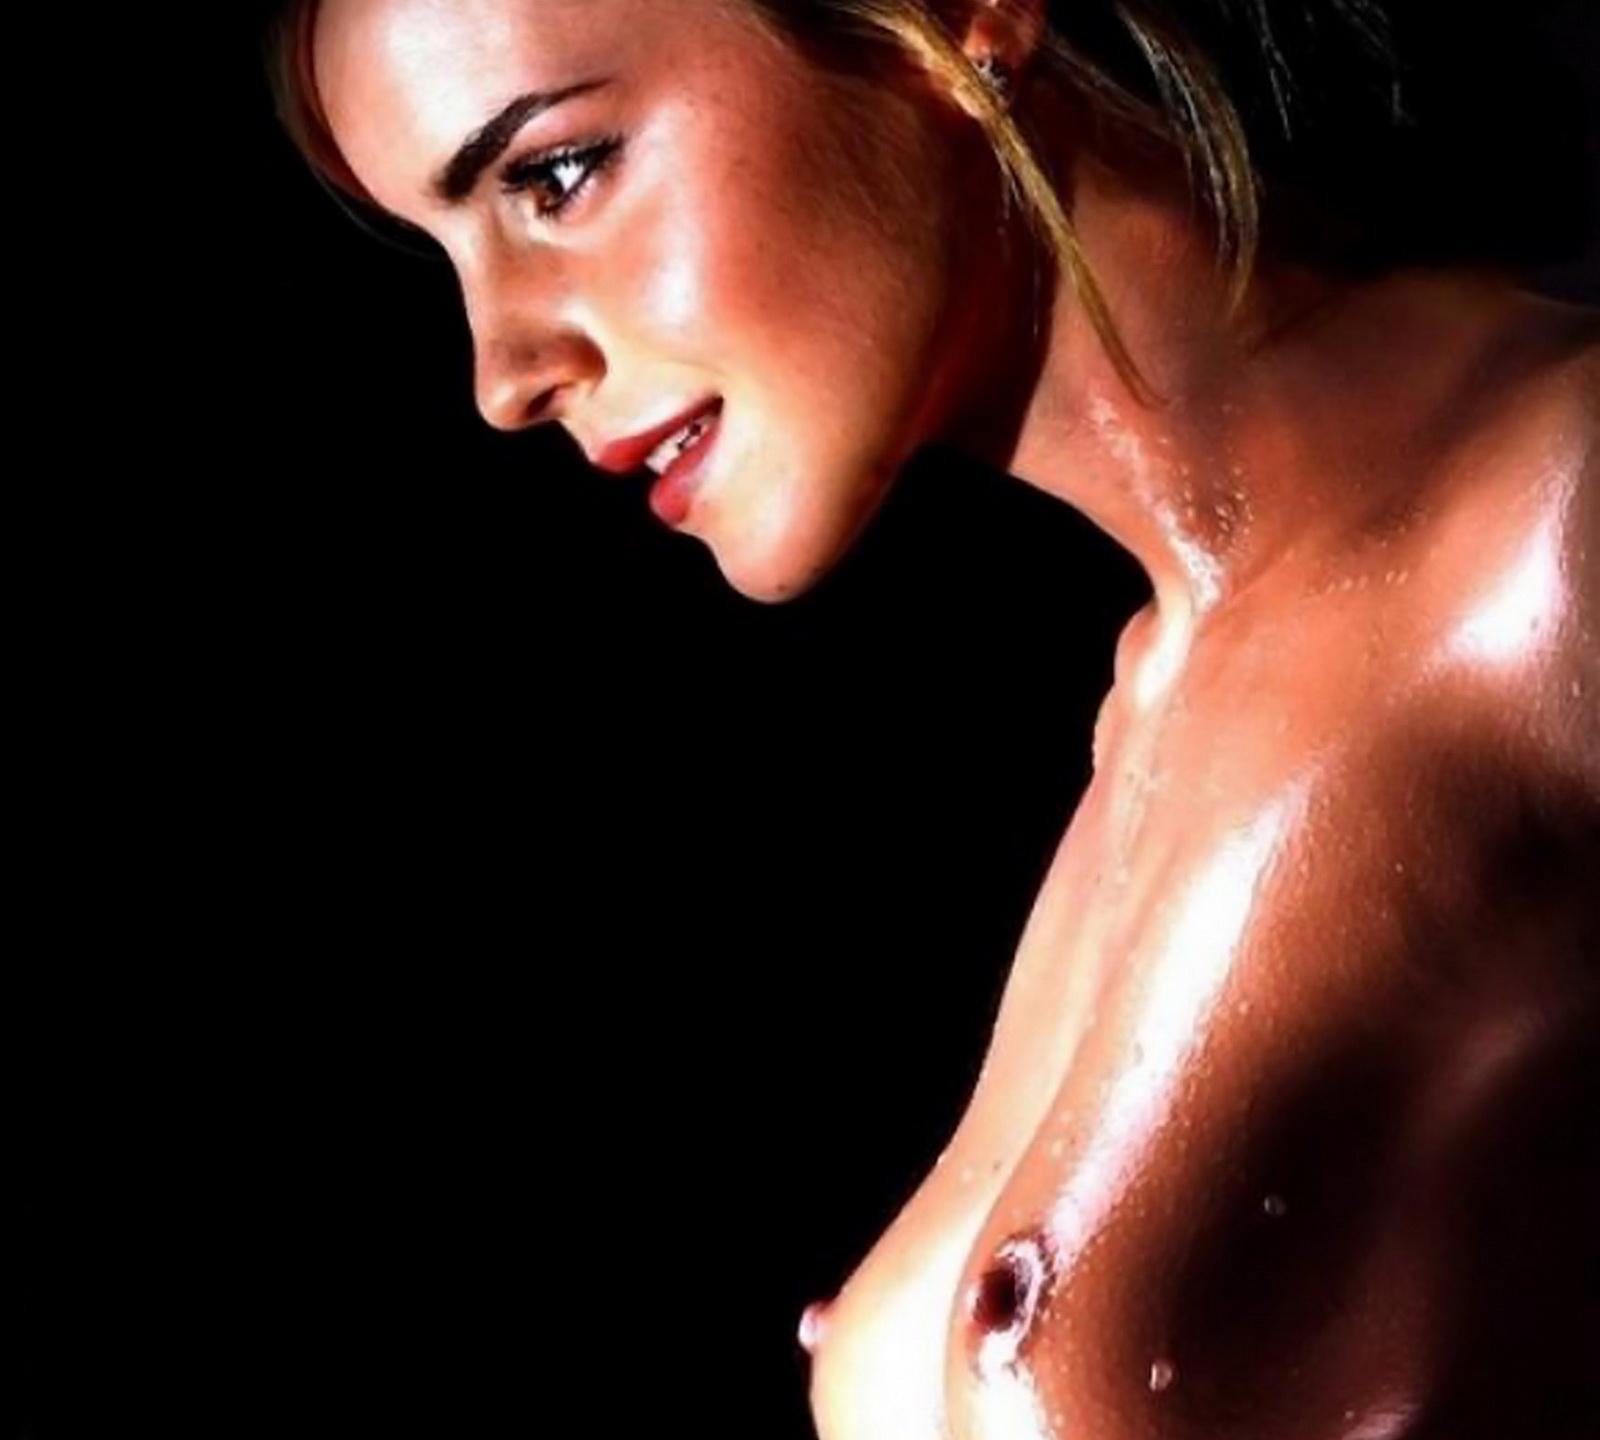 emma-watson-topless